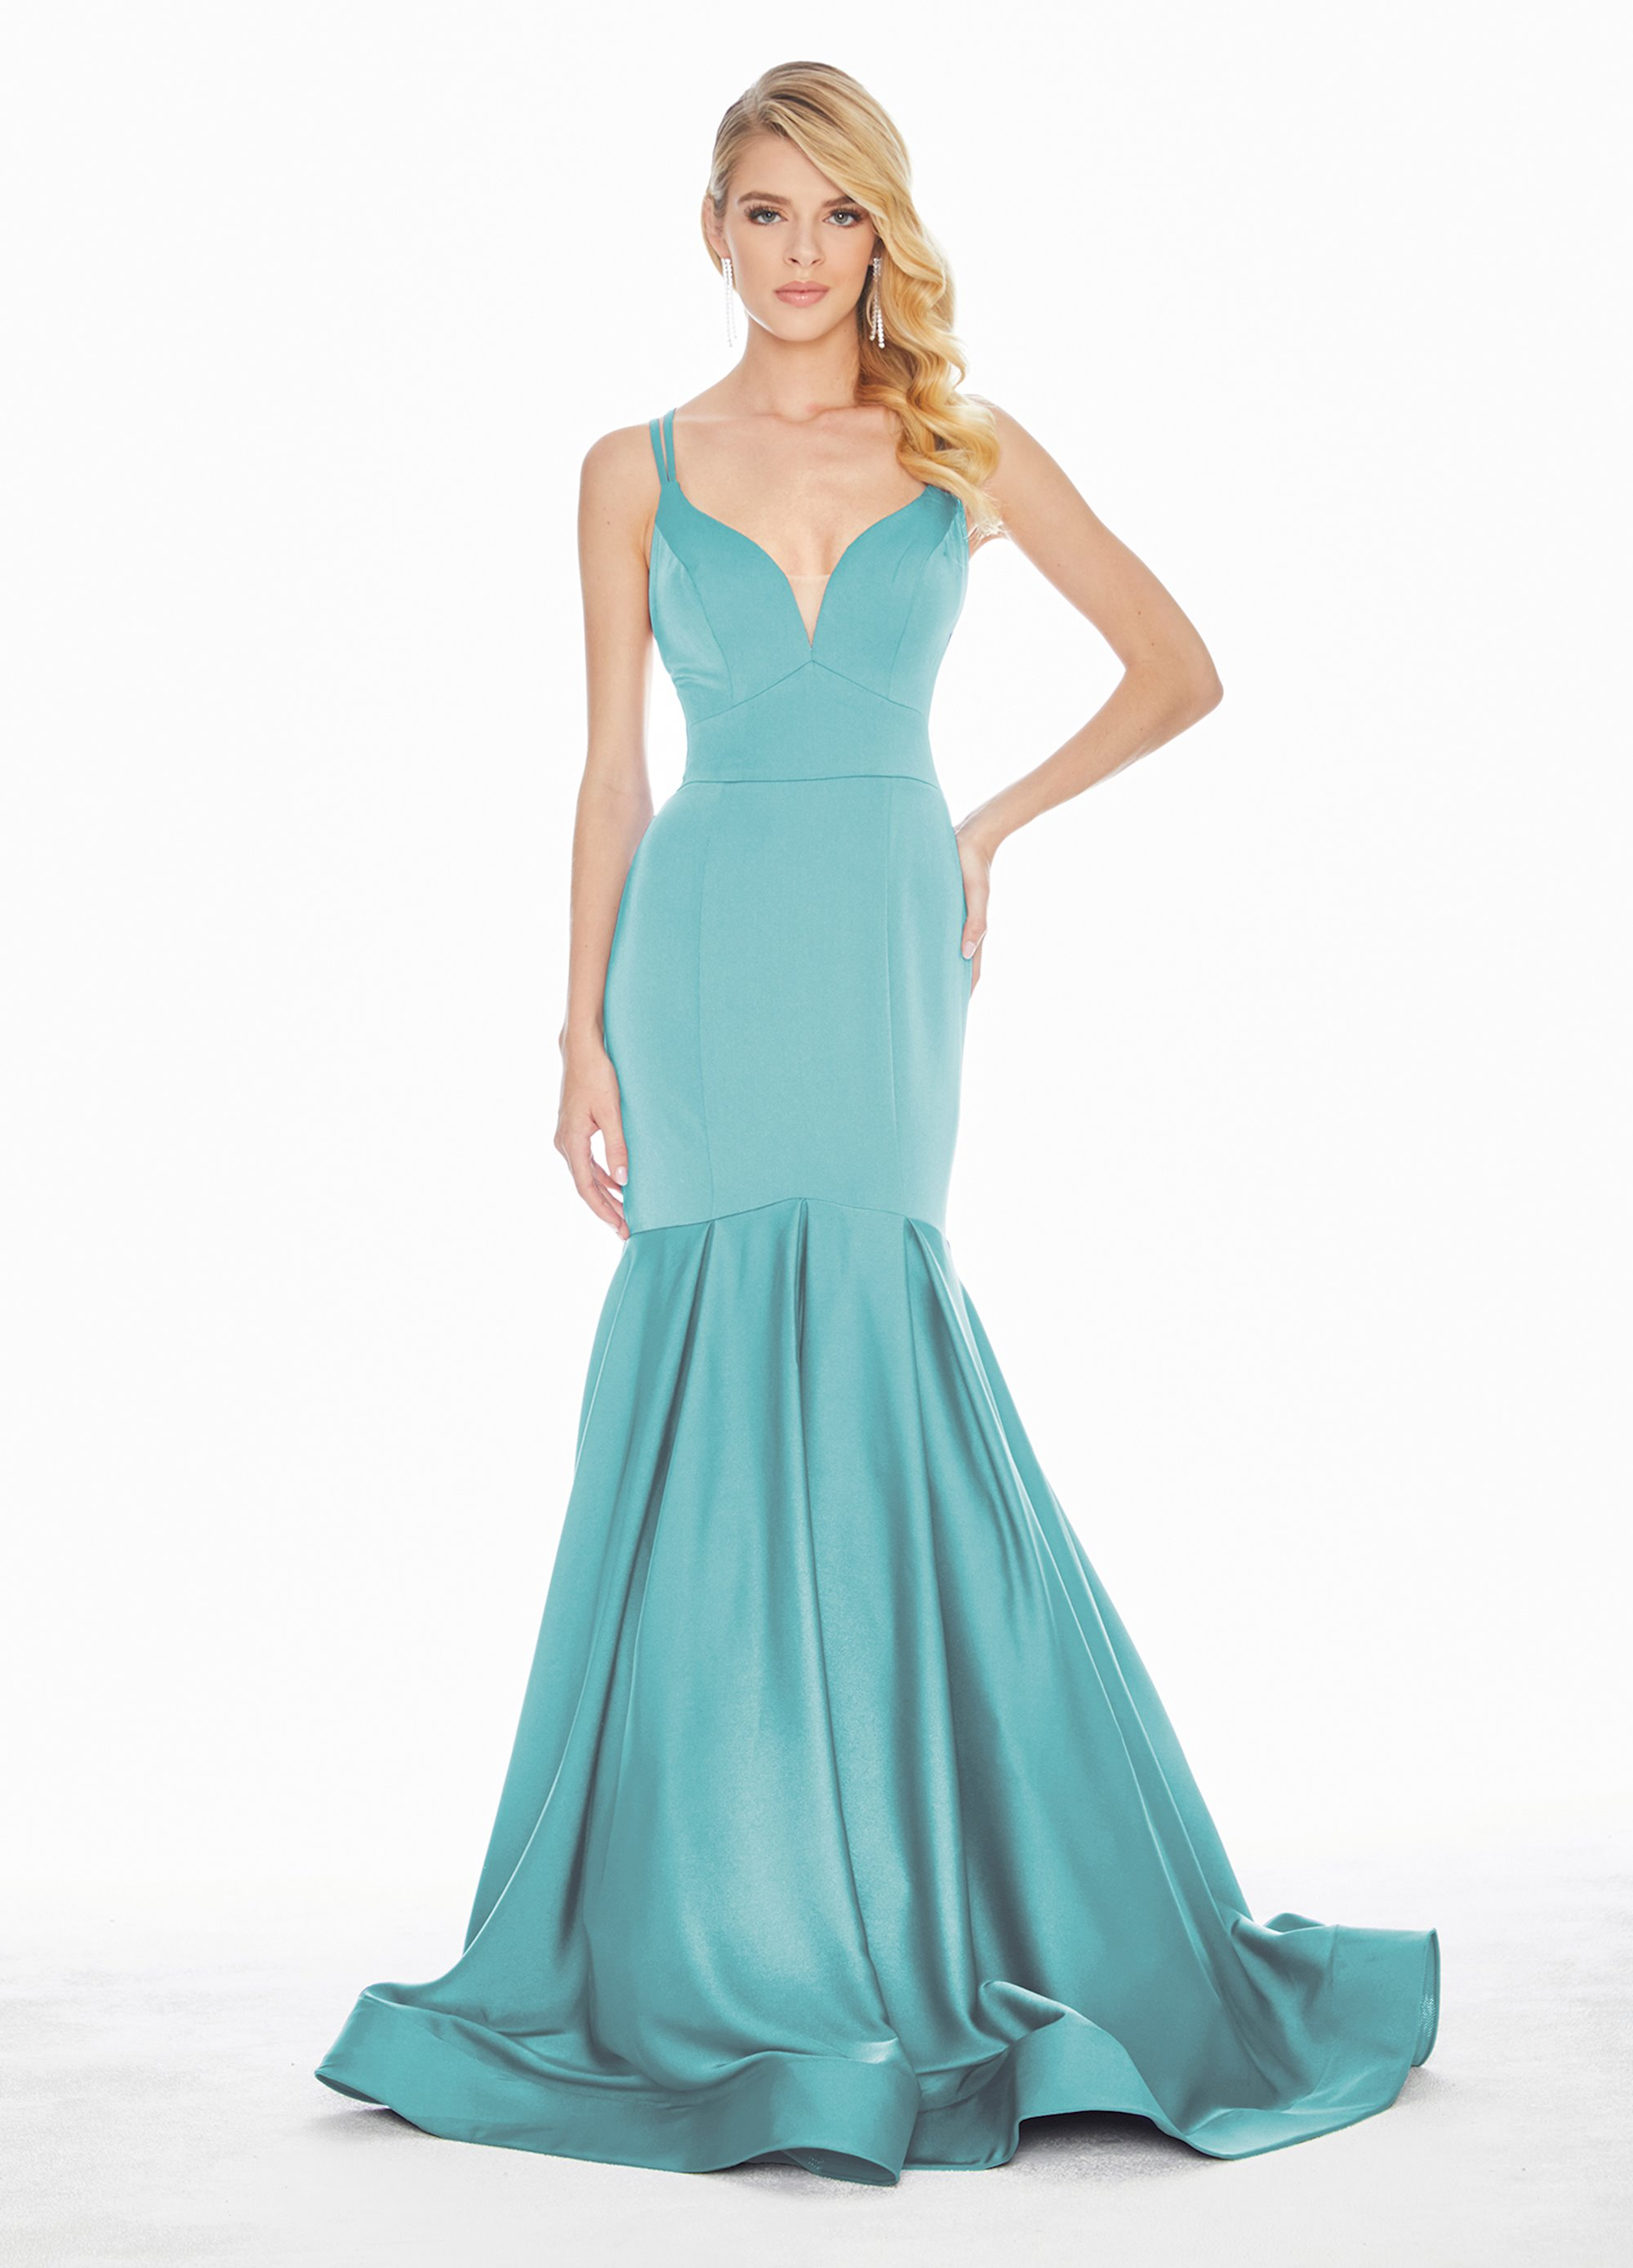 Ashley Lauren Crepe Fit Amp Flare Evening Dress Ashleylauren